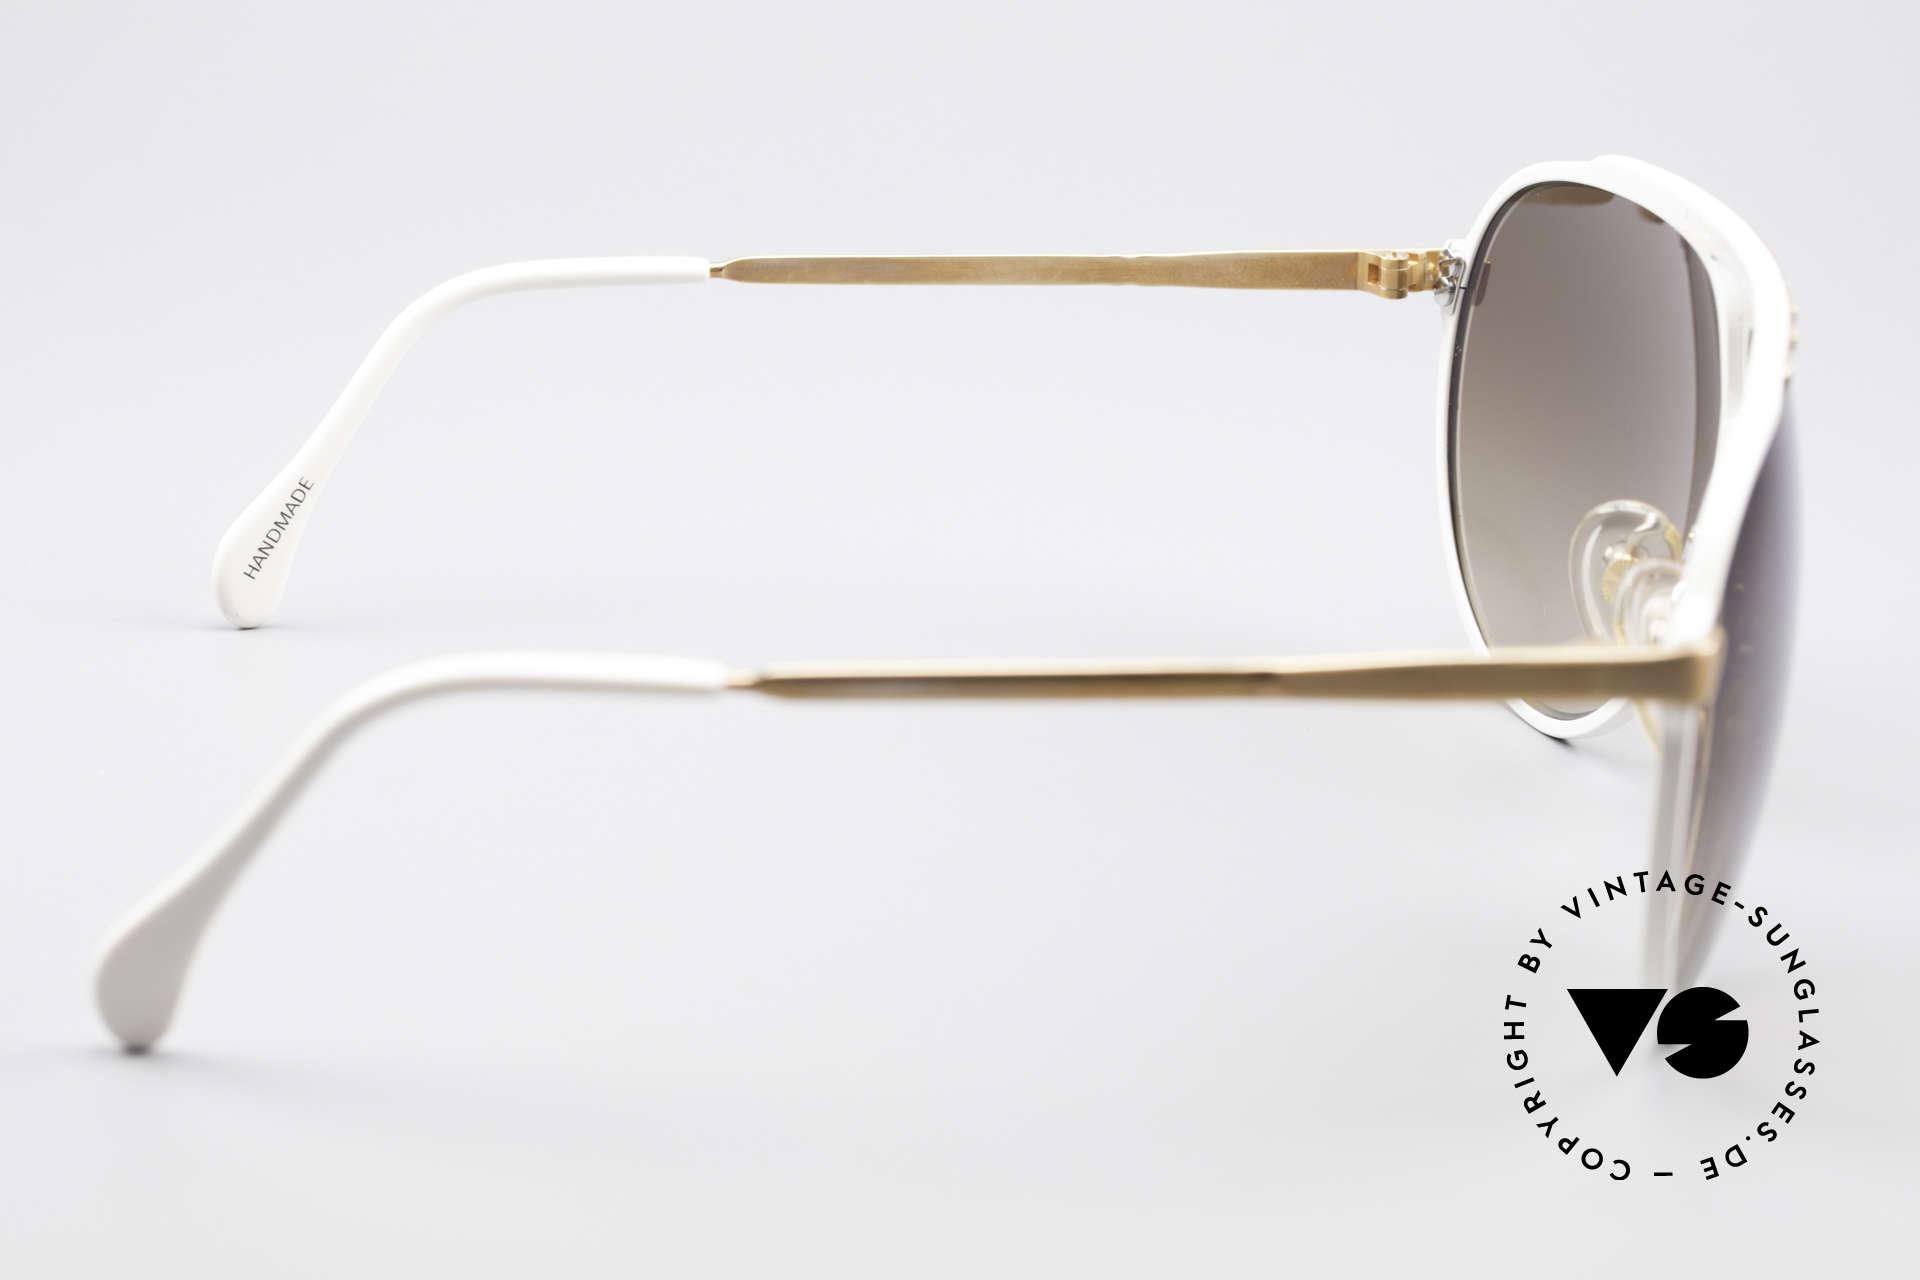 1ca5c2cea862 Sunglasses Alpina M1 Iconic West Germany Shades | Vintage Sunglasses